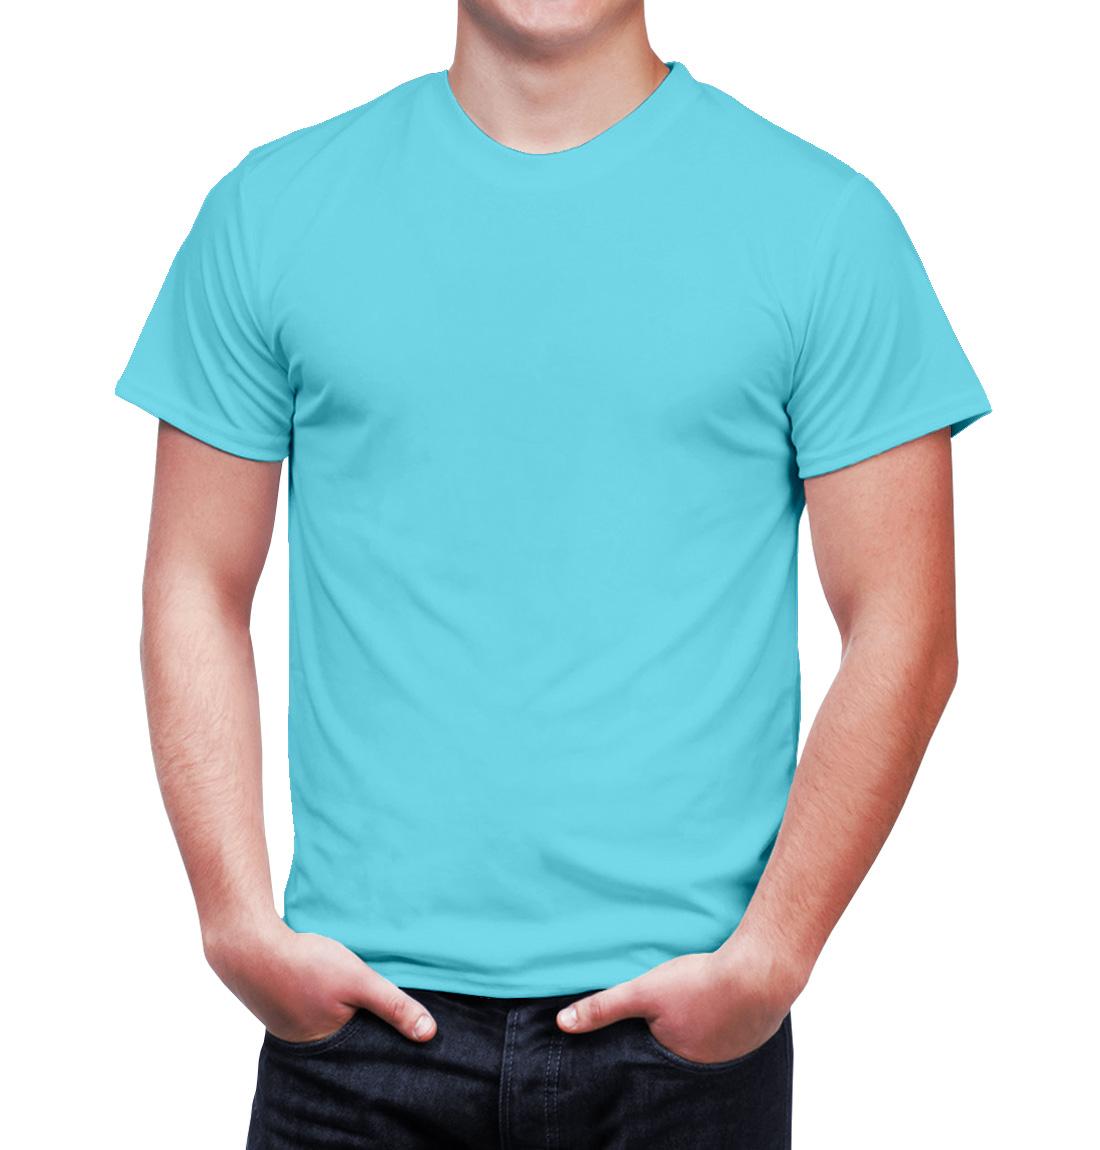 Enharid-Classic-T-Shirt-Sky-Blue